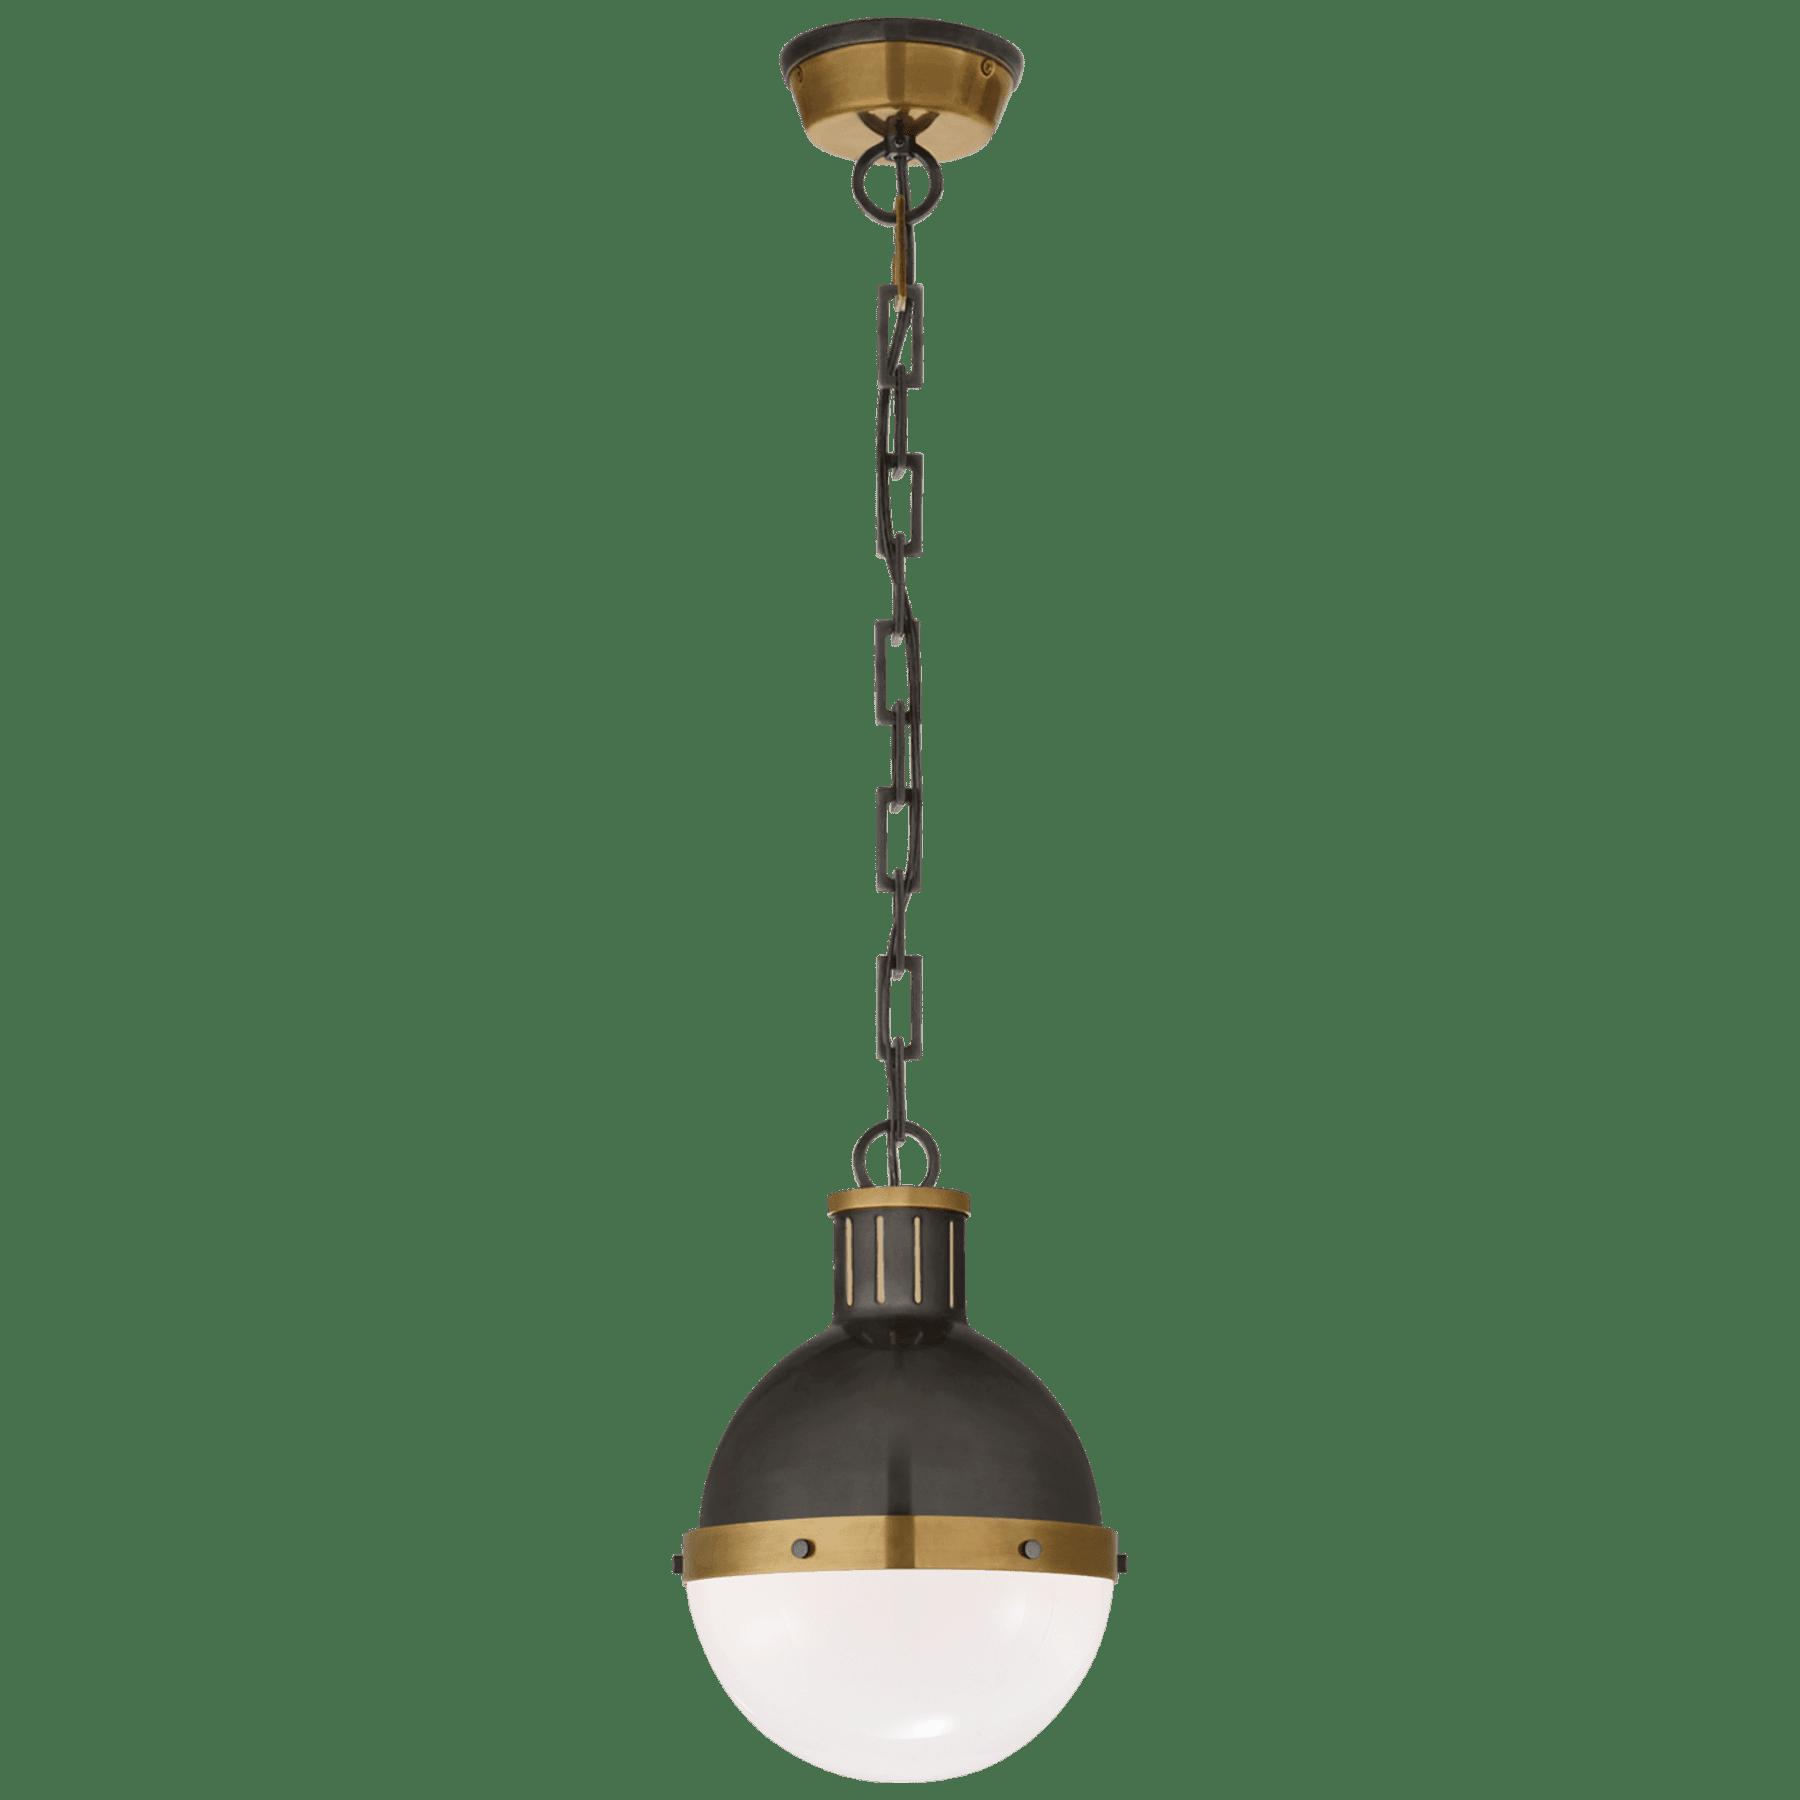 Circa Lighting Hicks Small Pendant